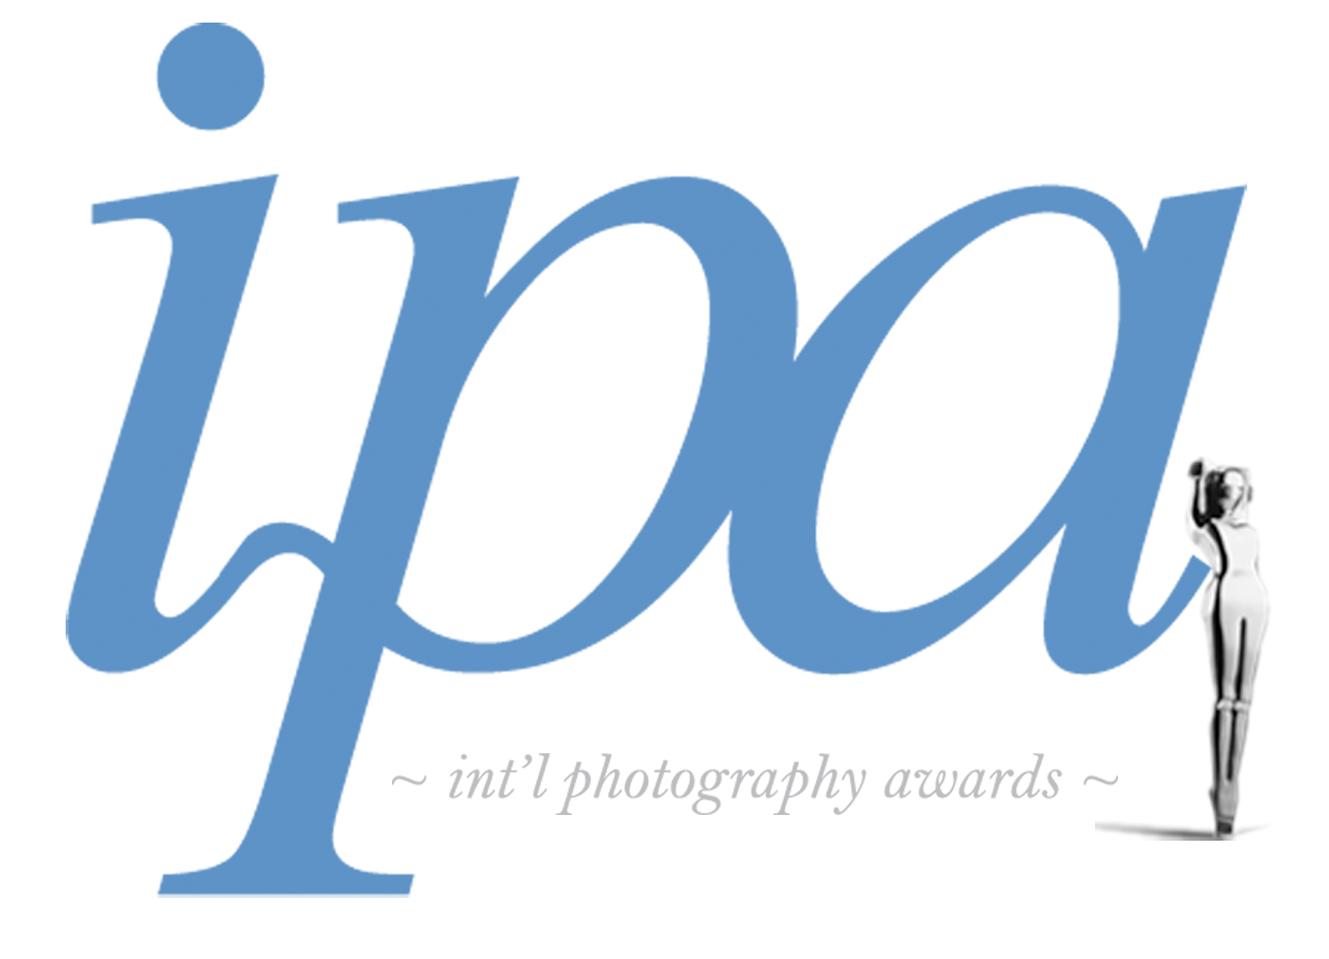 certificate_logo.jpg